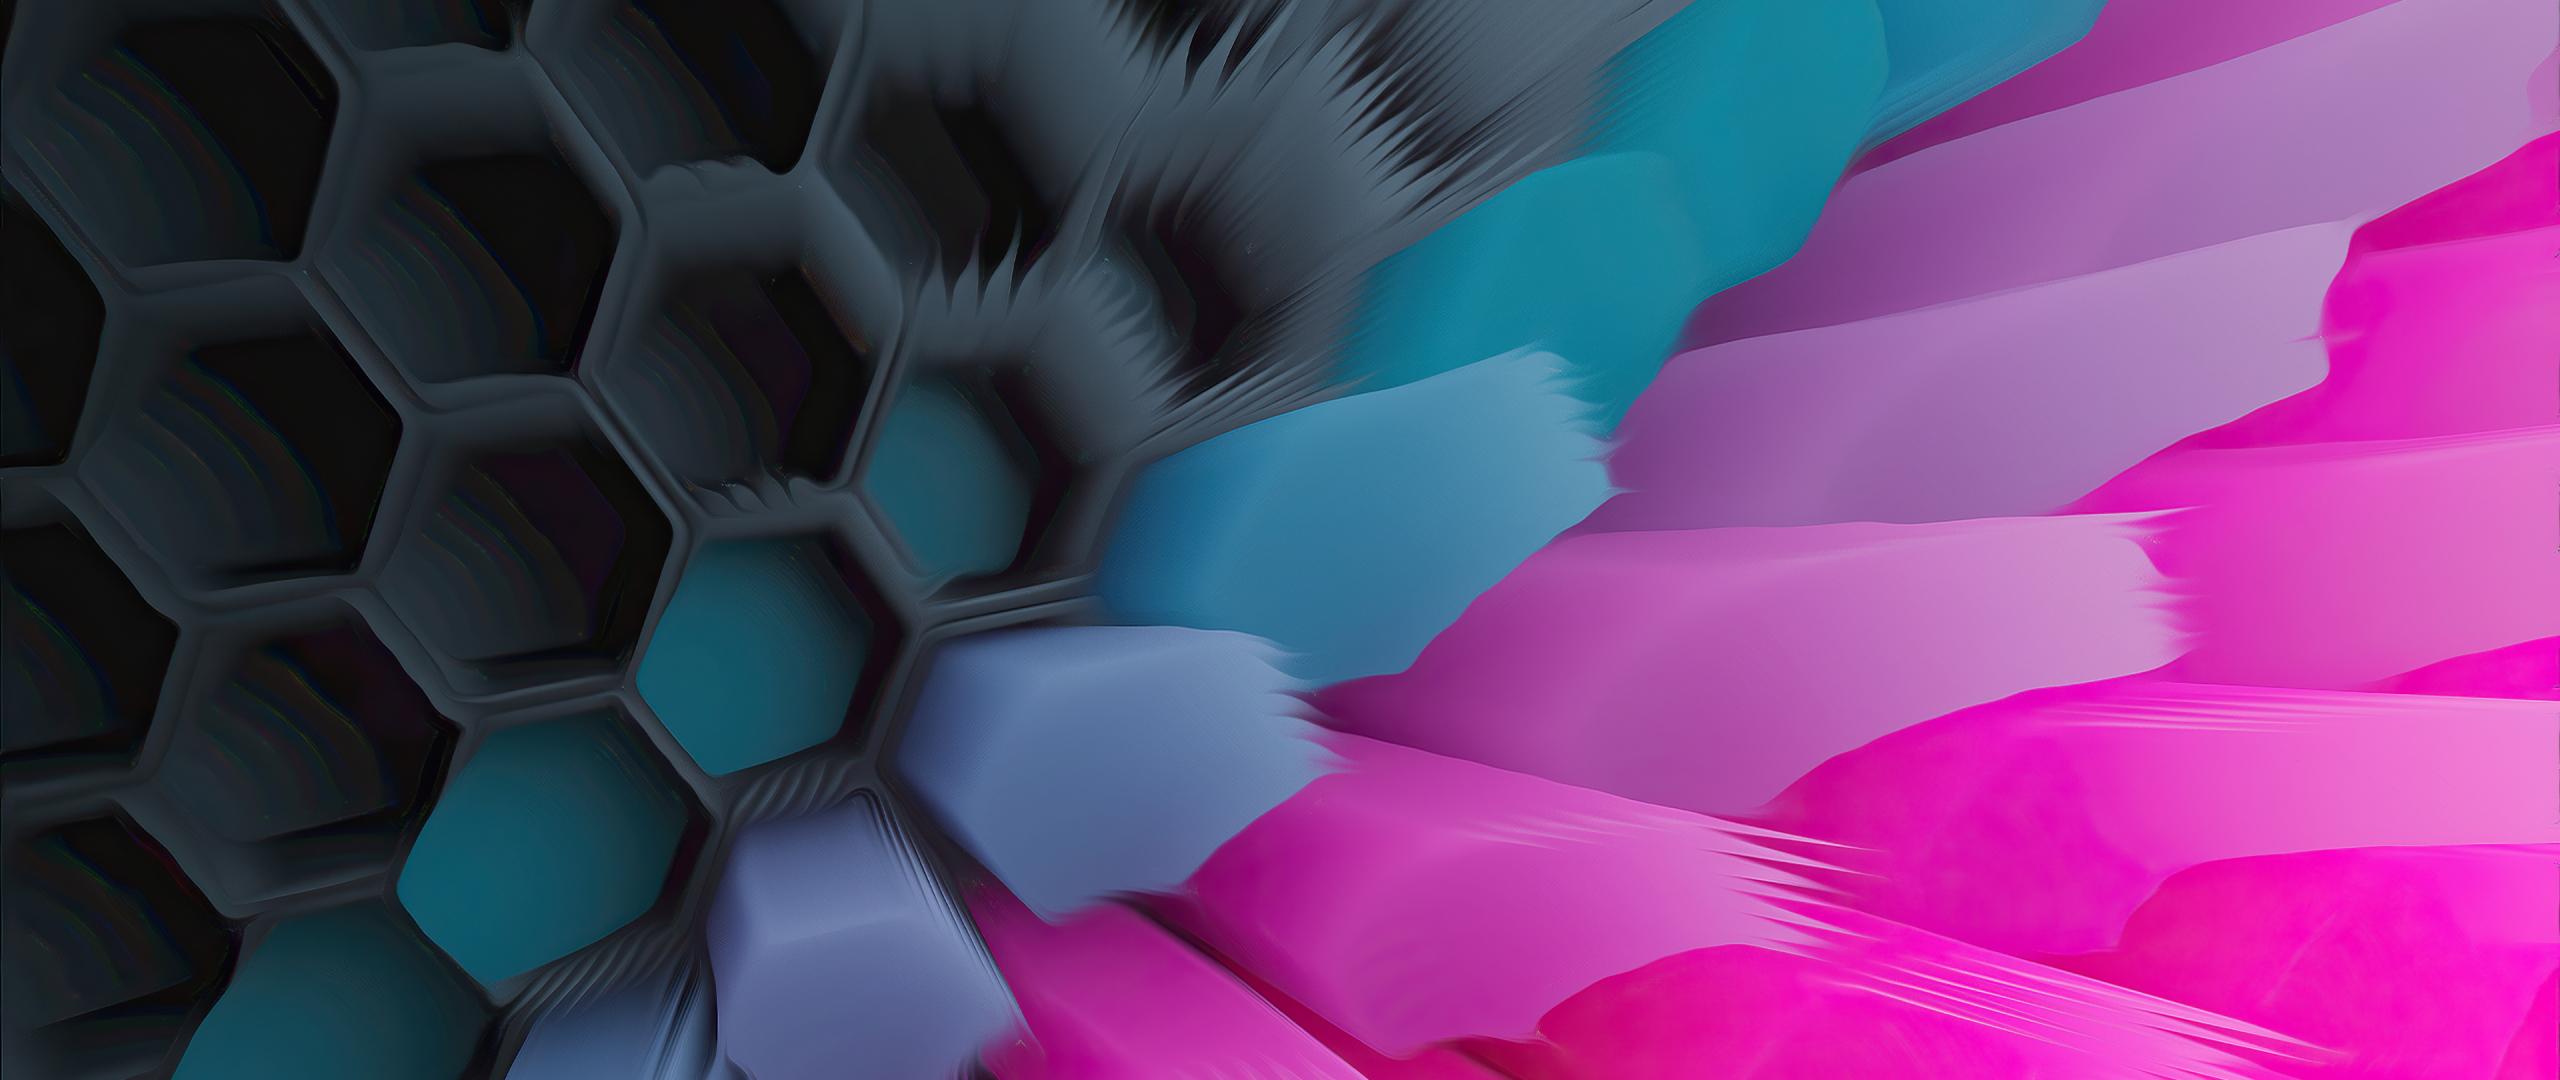 Pink Blue 4K Hexagon Wallpaper in 2560x1080 Resolution